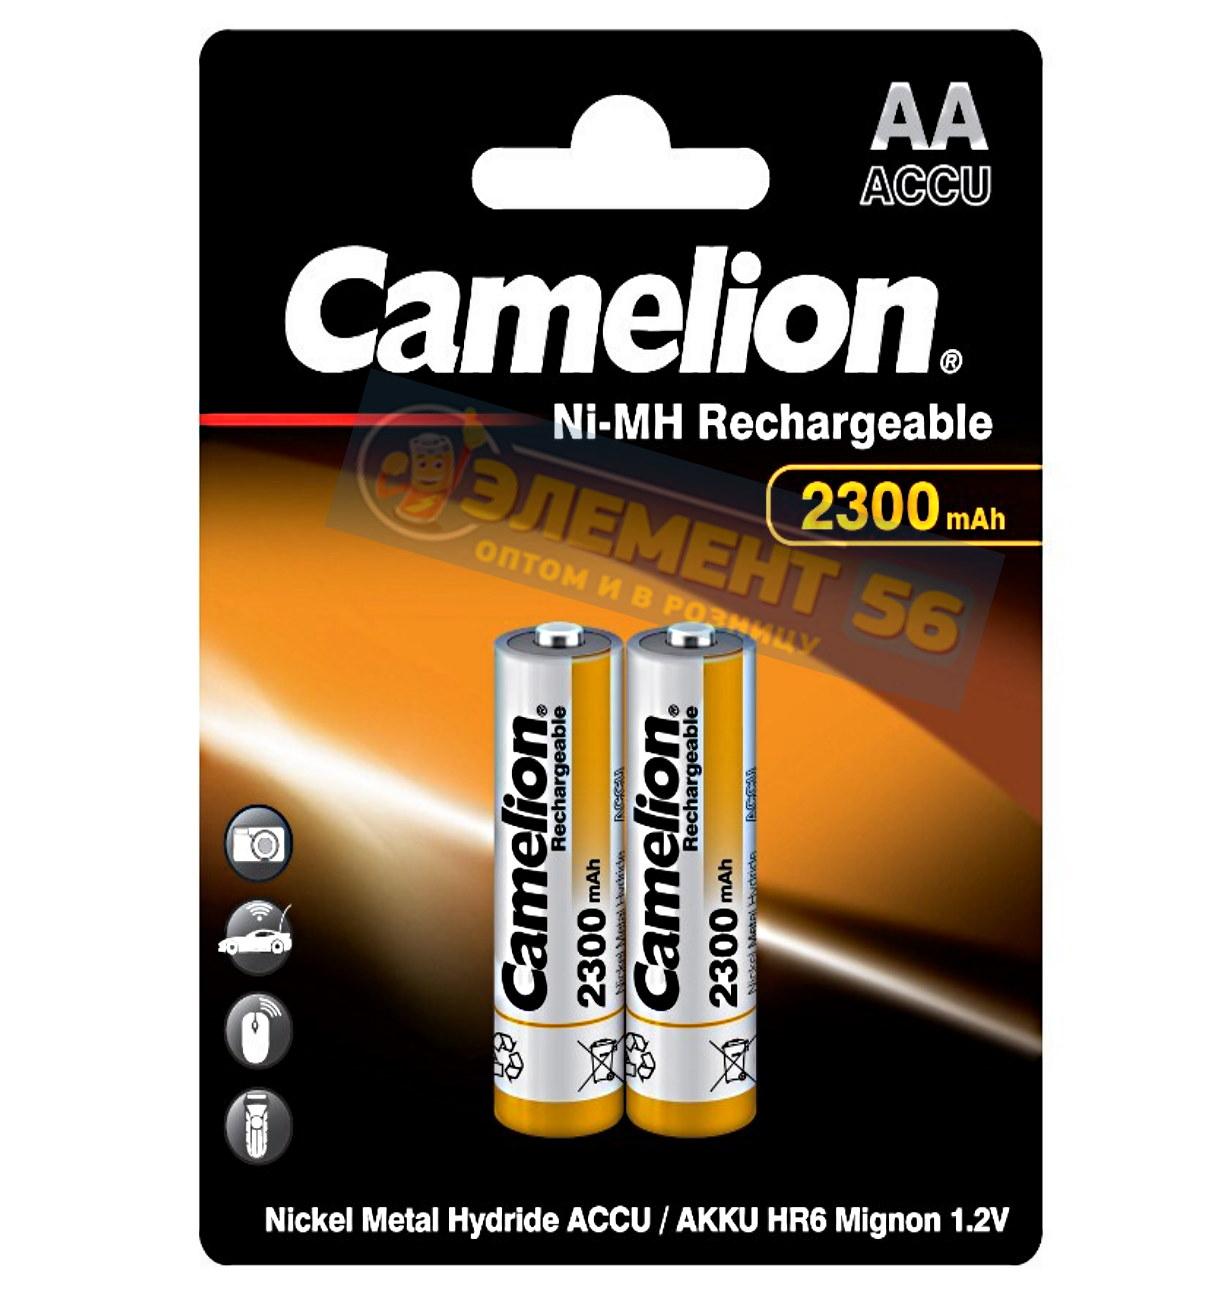 Аккумулятор CAMELION AA, HR6 (2300 mAh) MN1500, А316 2BL (2) (24) (384)